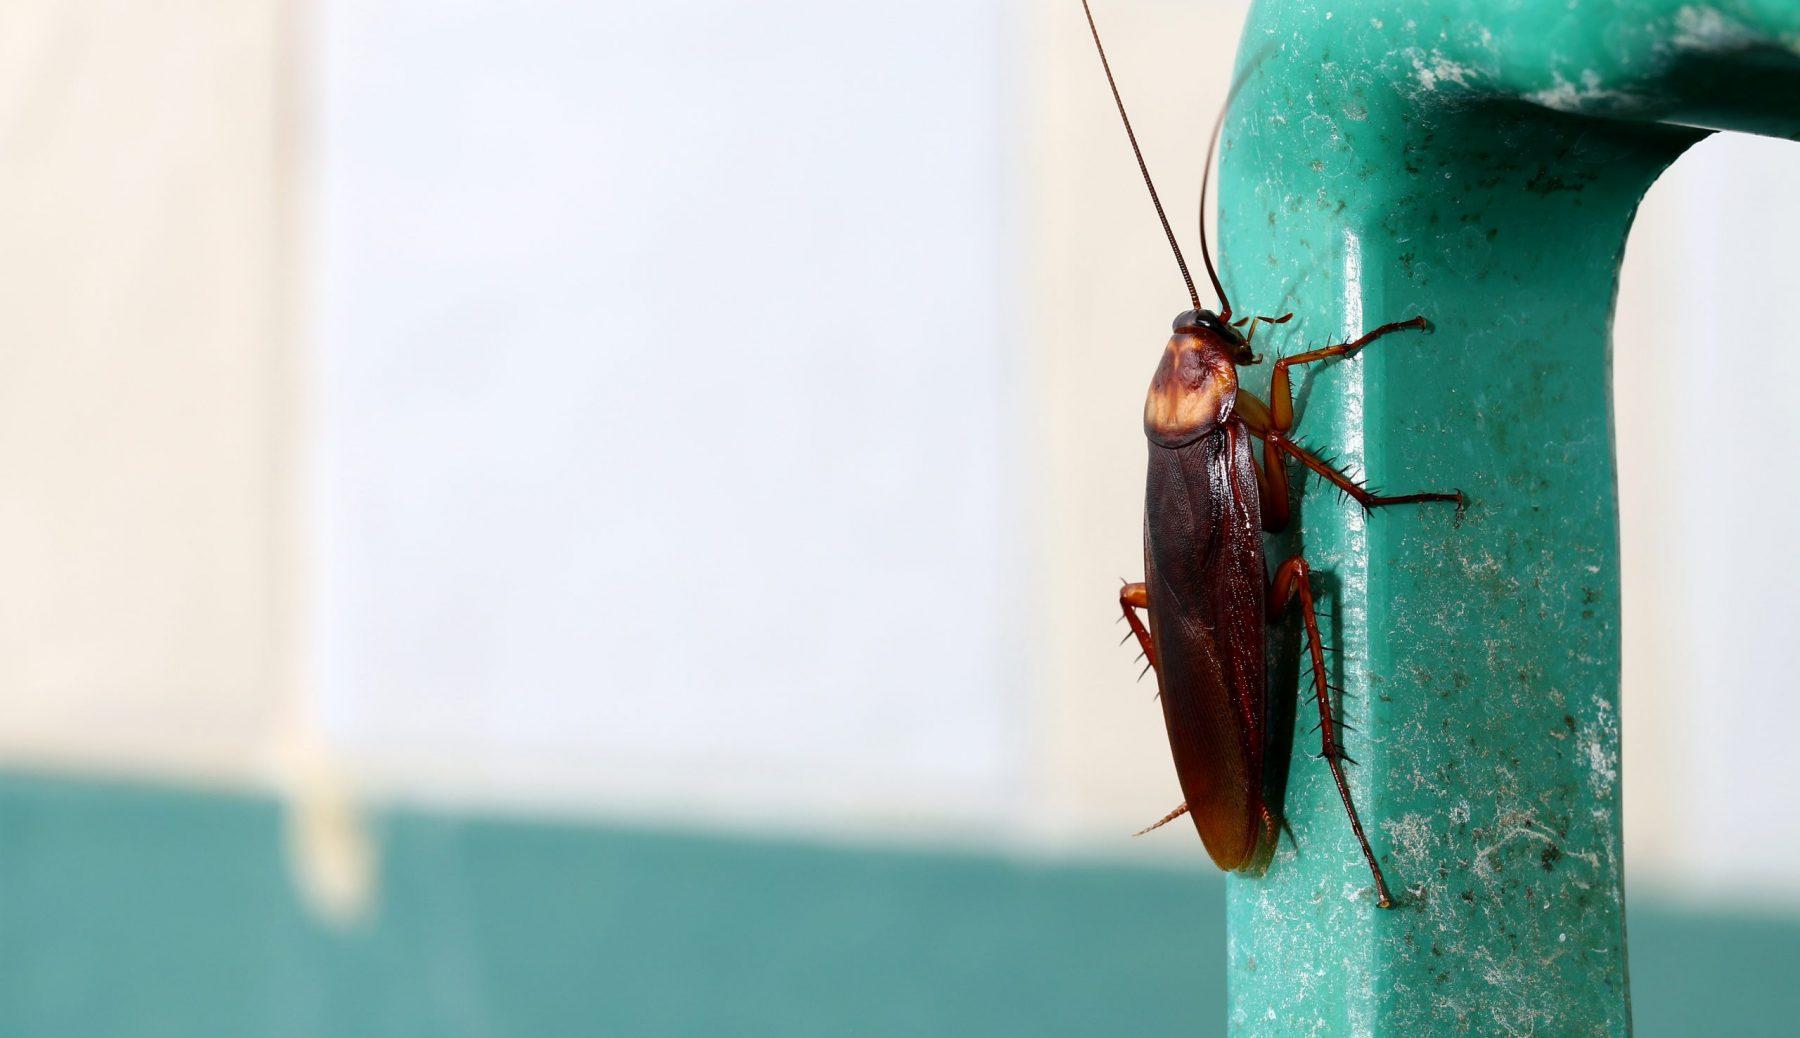 Single cockroach on green handle